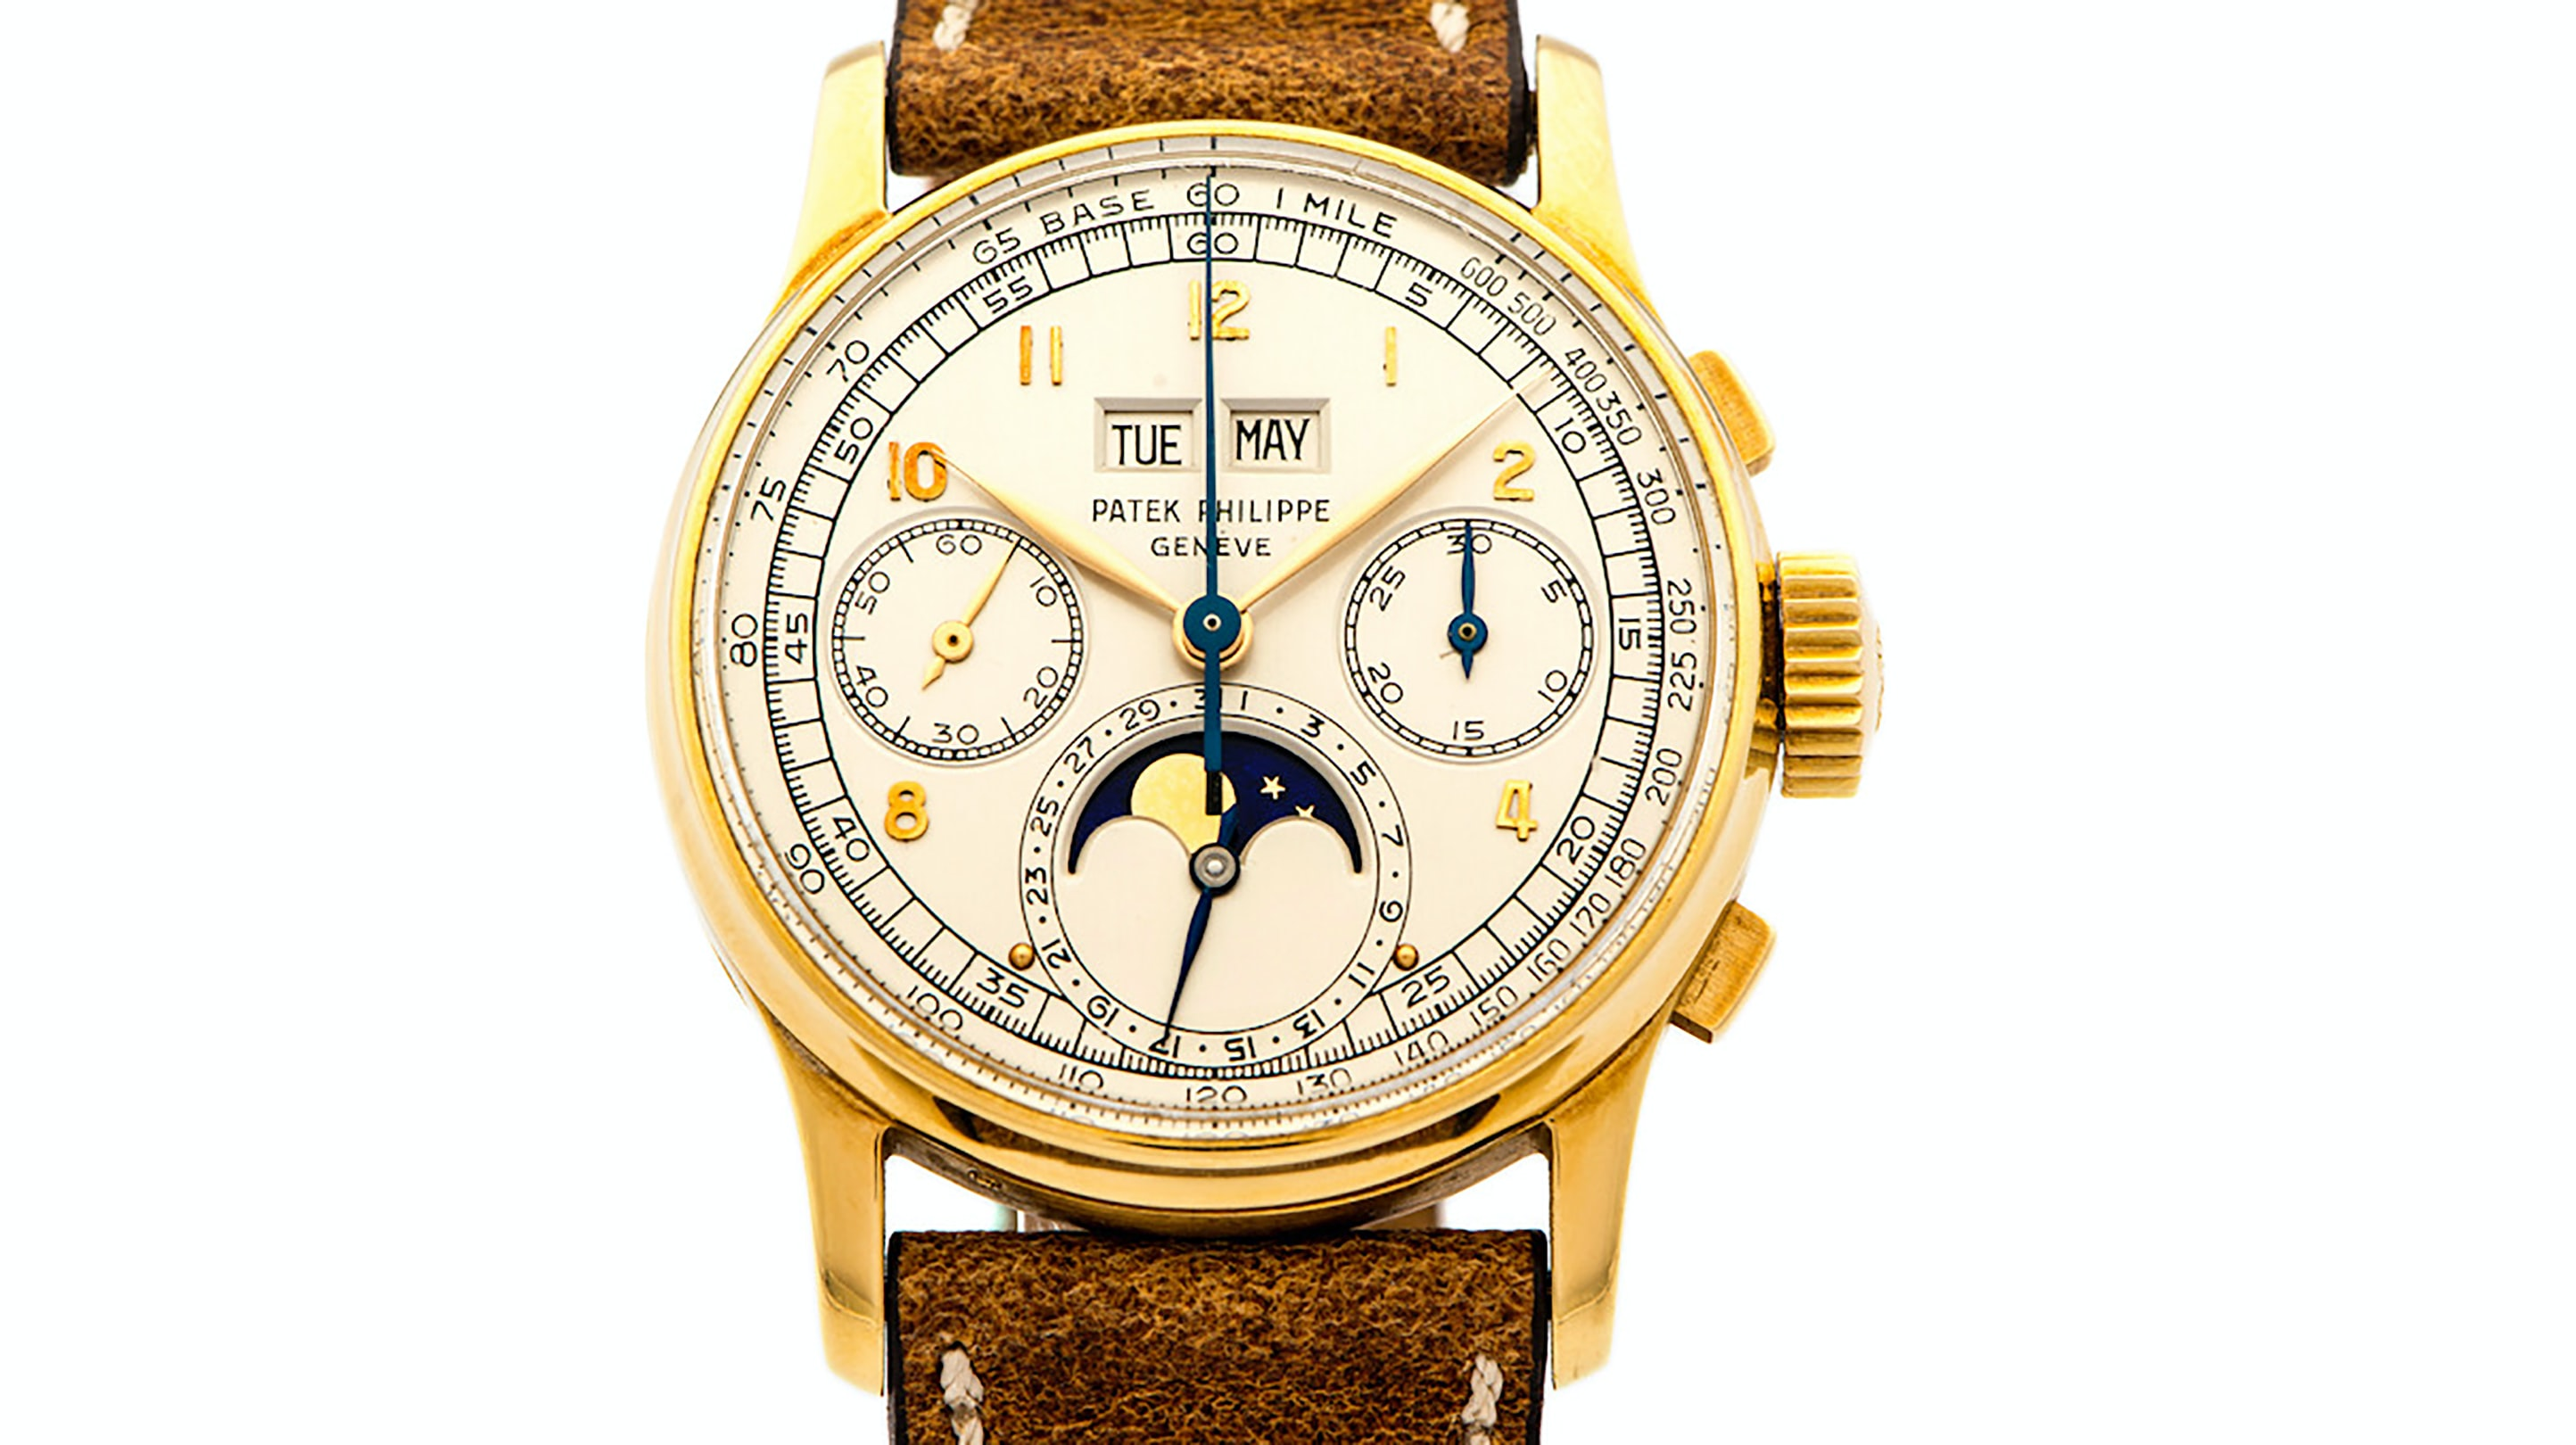 Psa hero.jpg?ixlib=rails 1.1  Watch Collector PSA: A Very Rare Patek Philippe 1518 In Yellow Gold Has Been Stolen (Please Share) PSA Hero